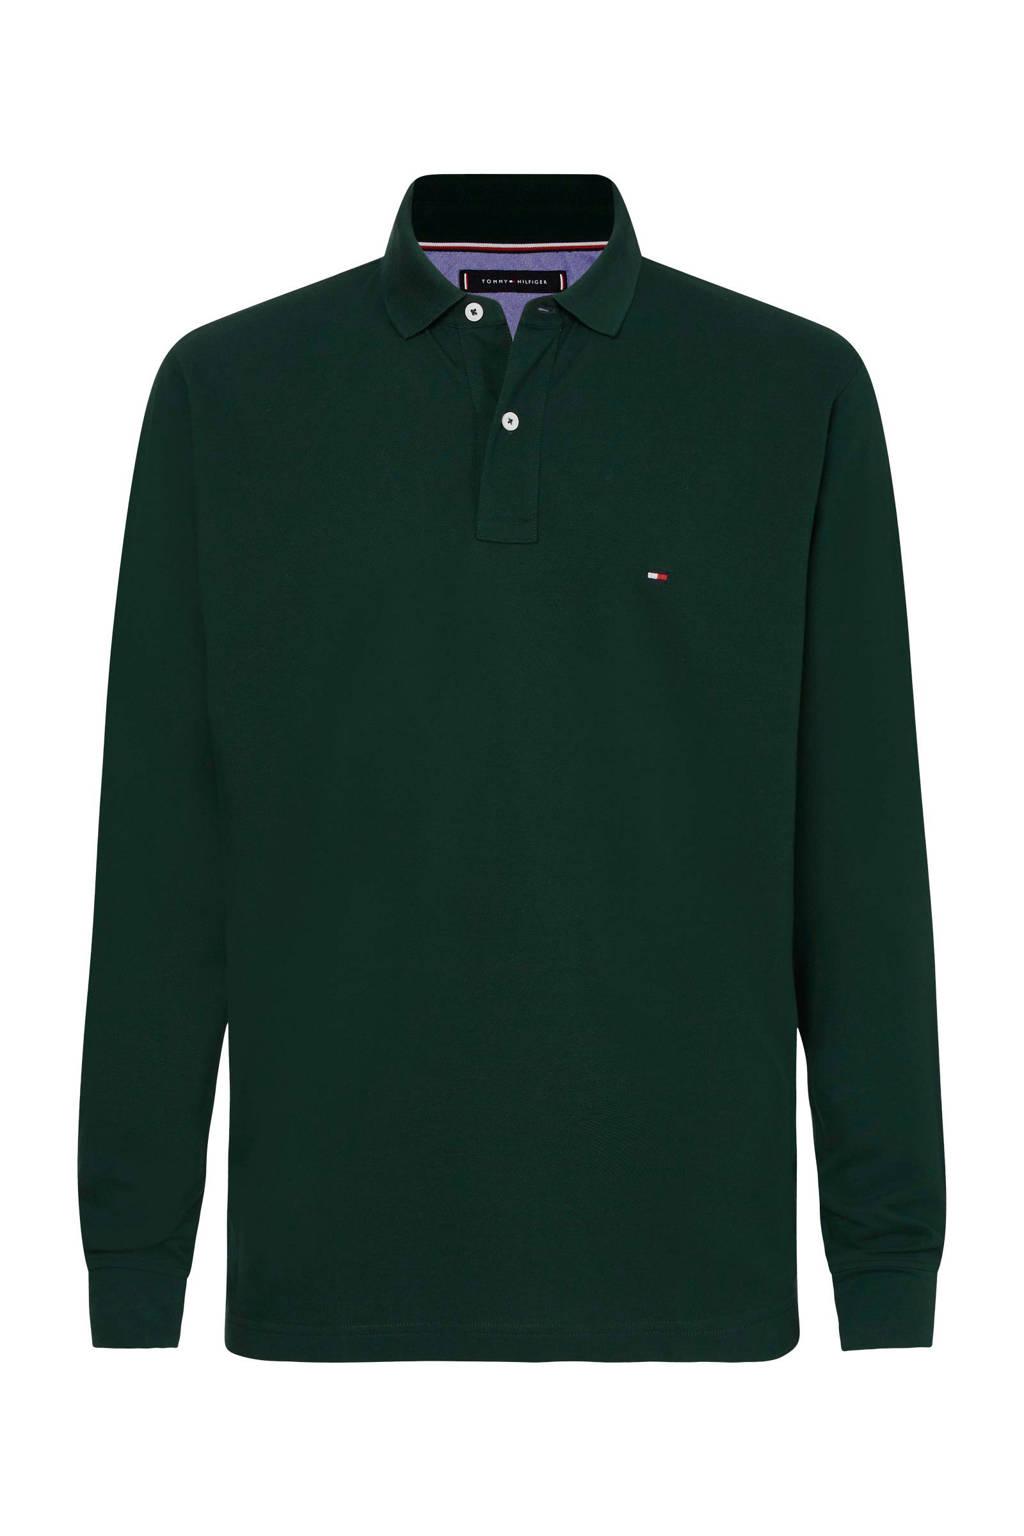 Tommy Hilfiger regular fit polo met logo donkergroen, Donkergroen